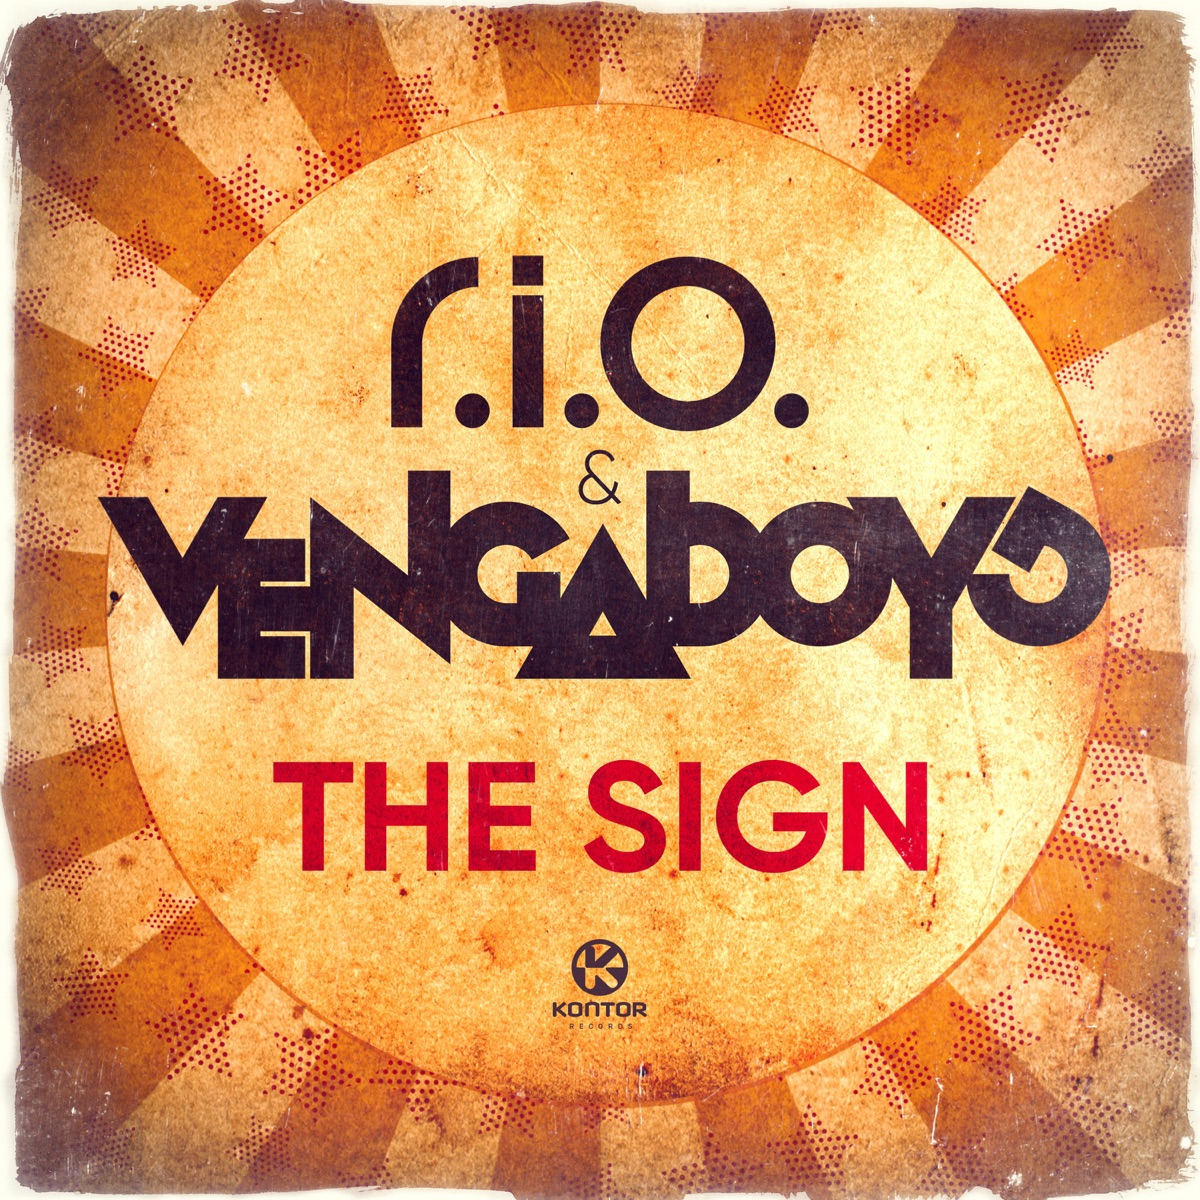 The Sign - Single Album Cover by R I O  & Vengaboys